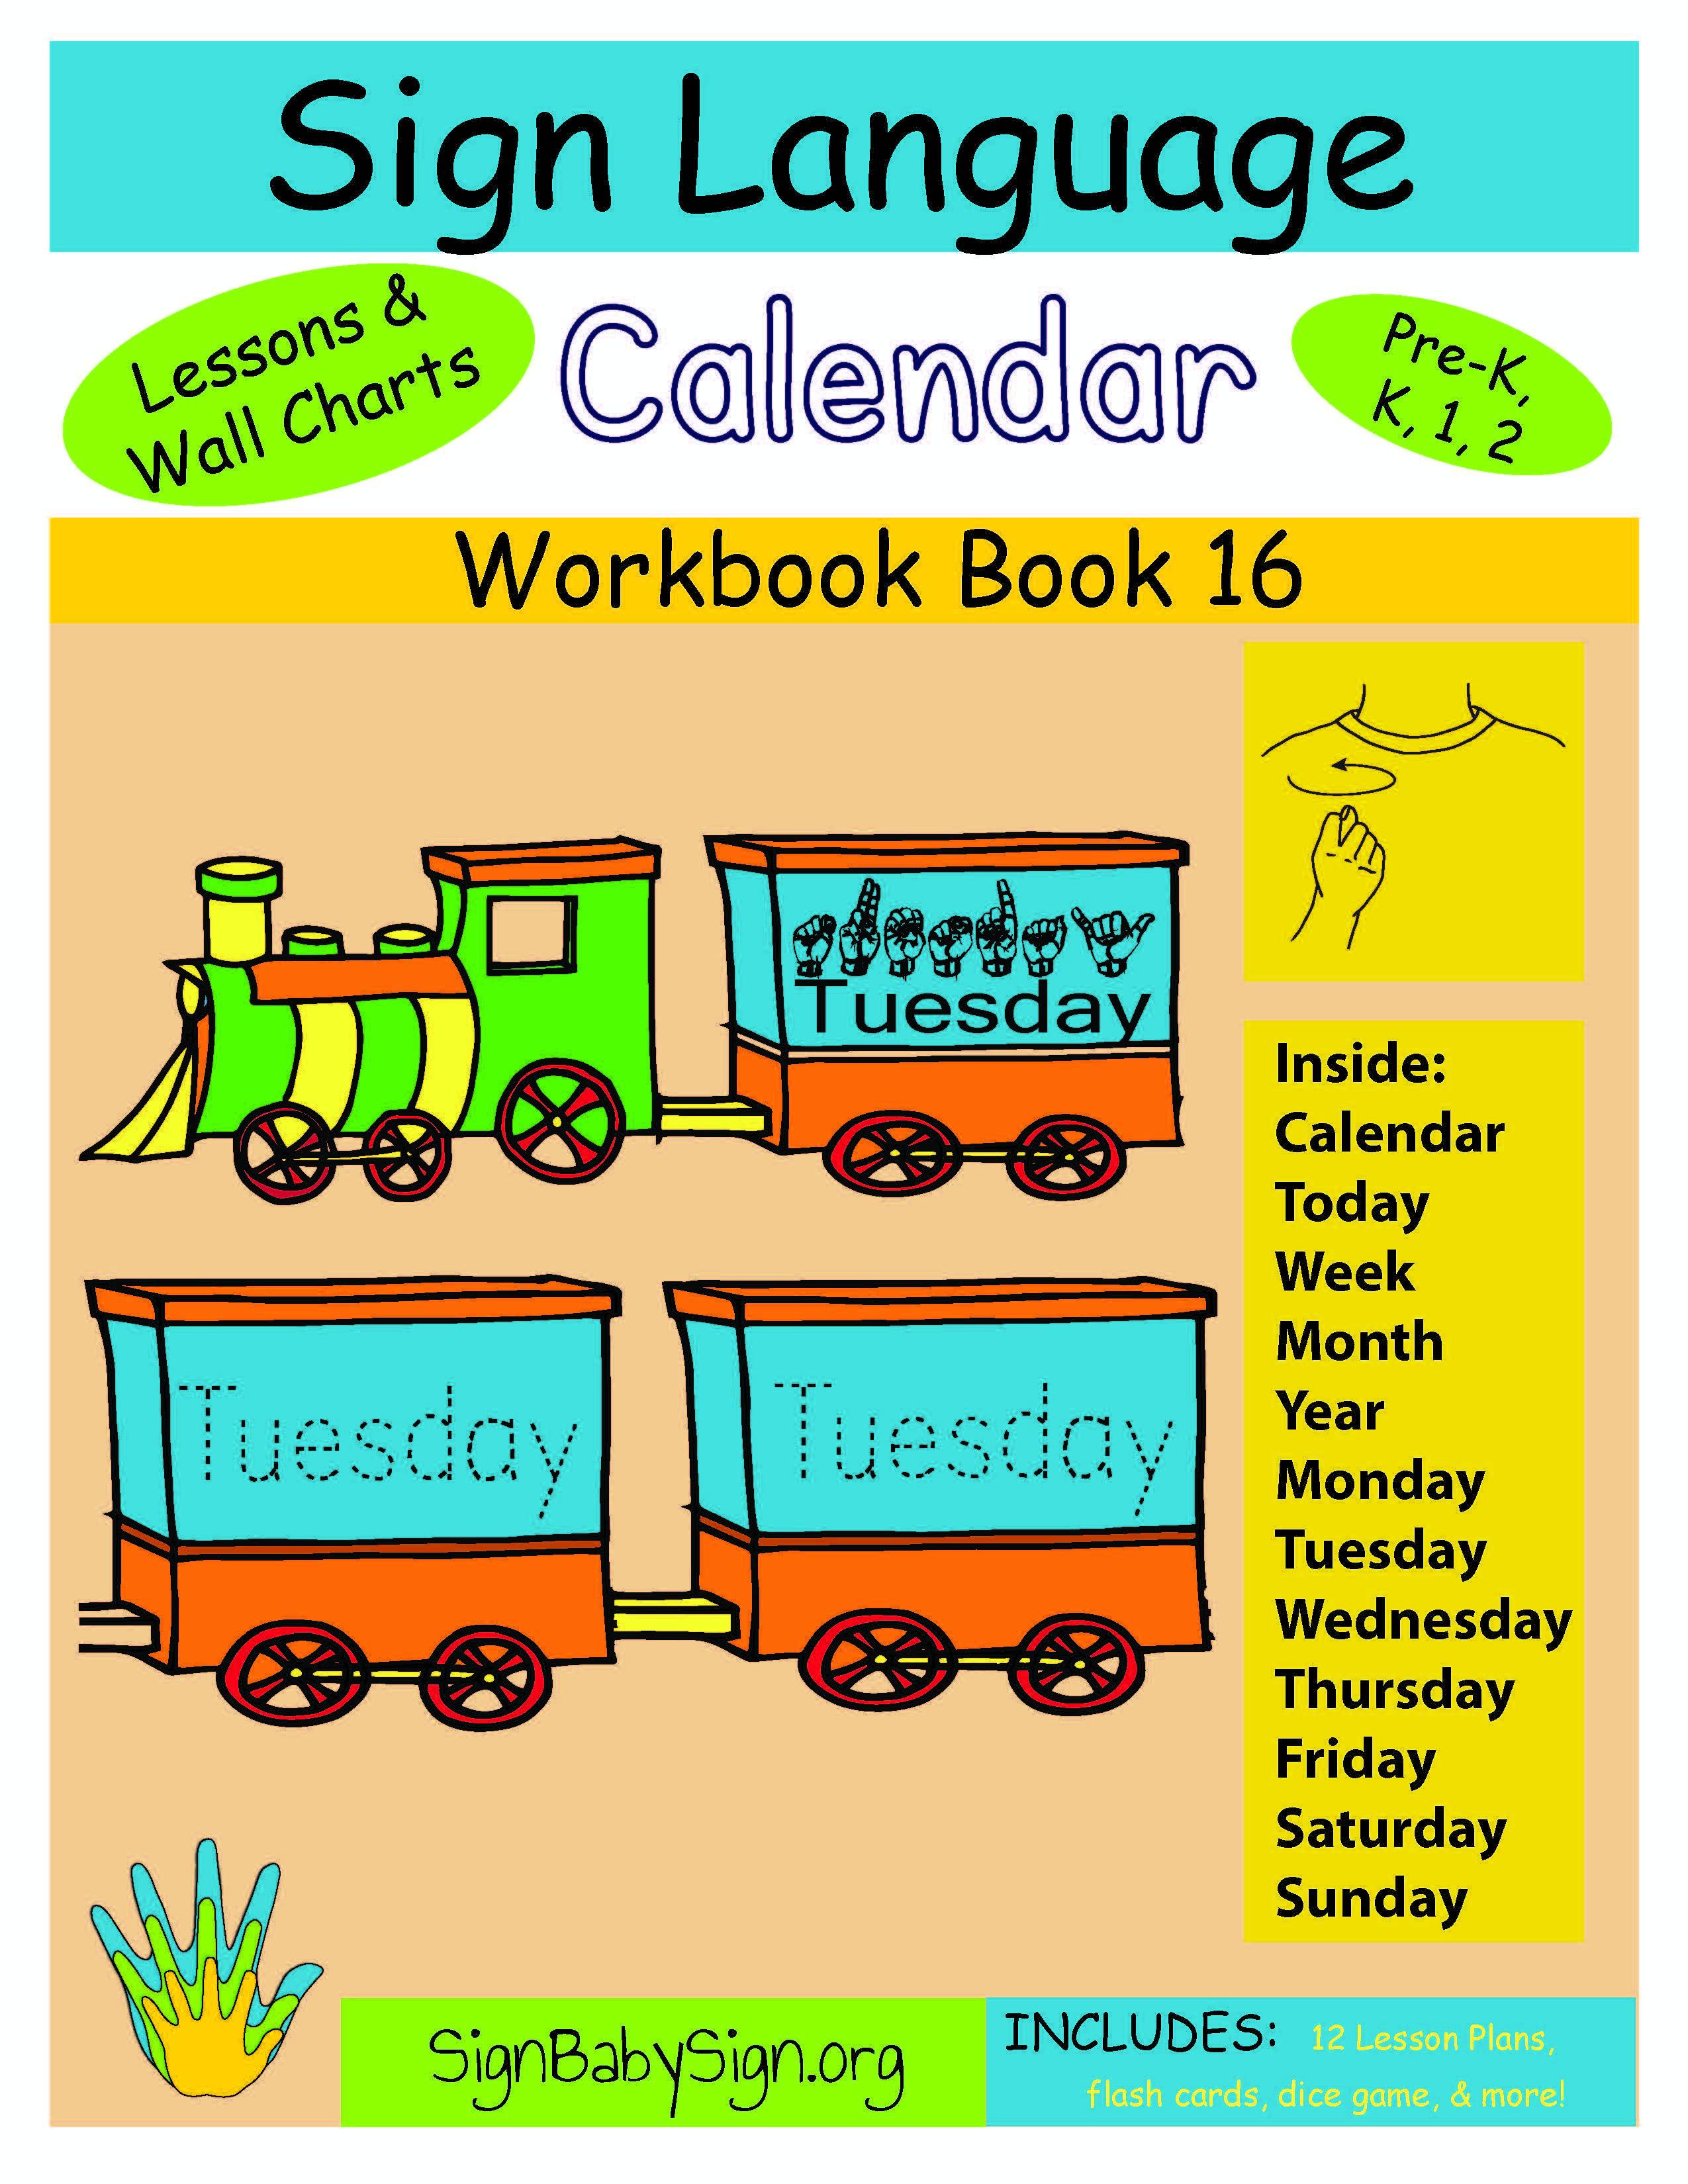 Lesson Plan Book 16 Calendar